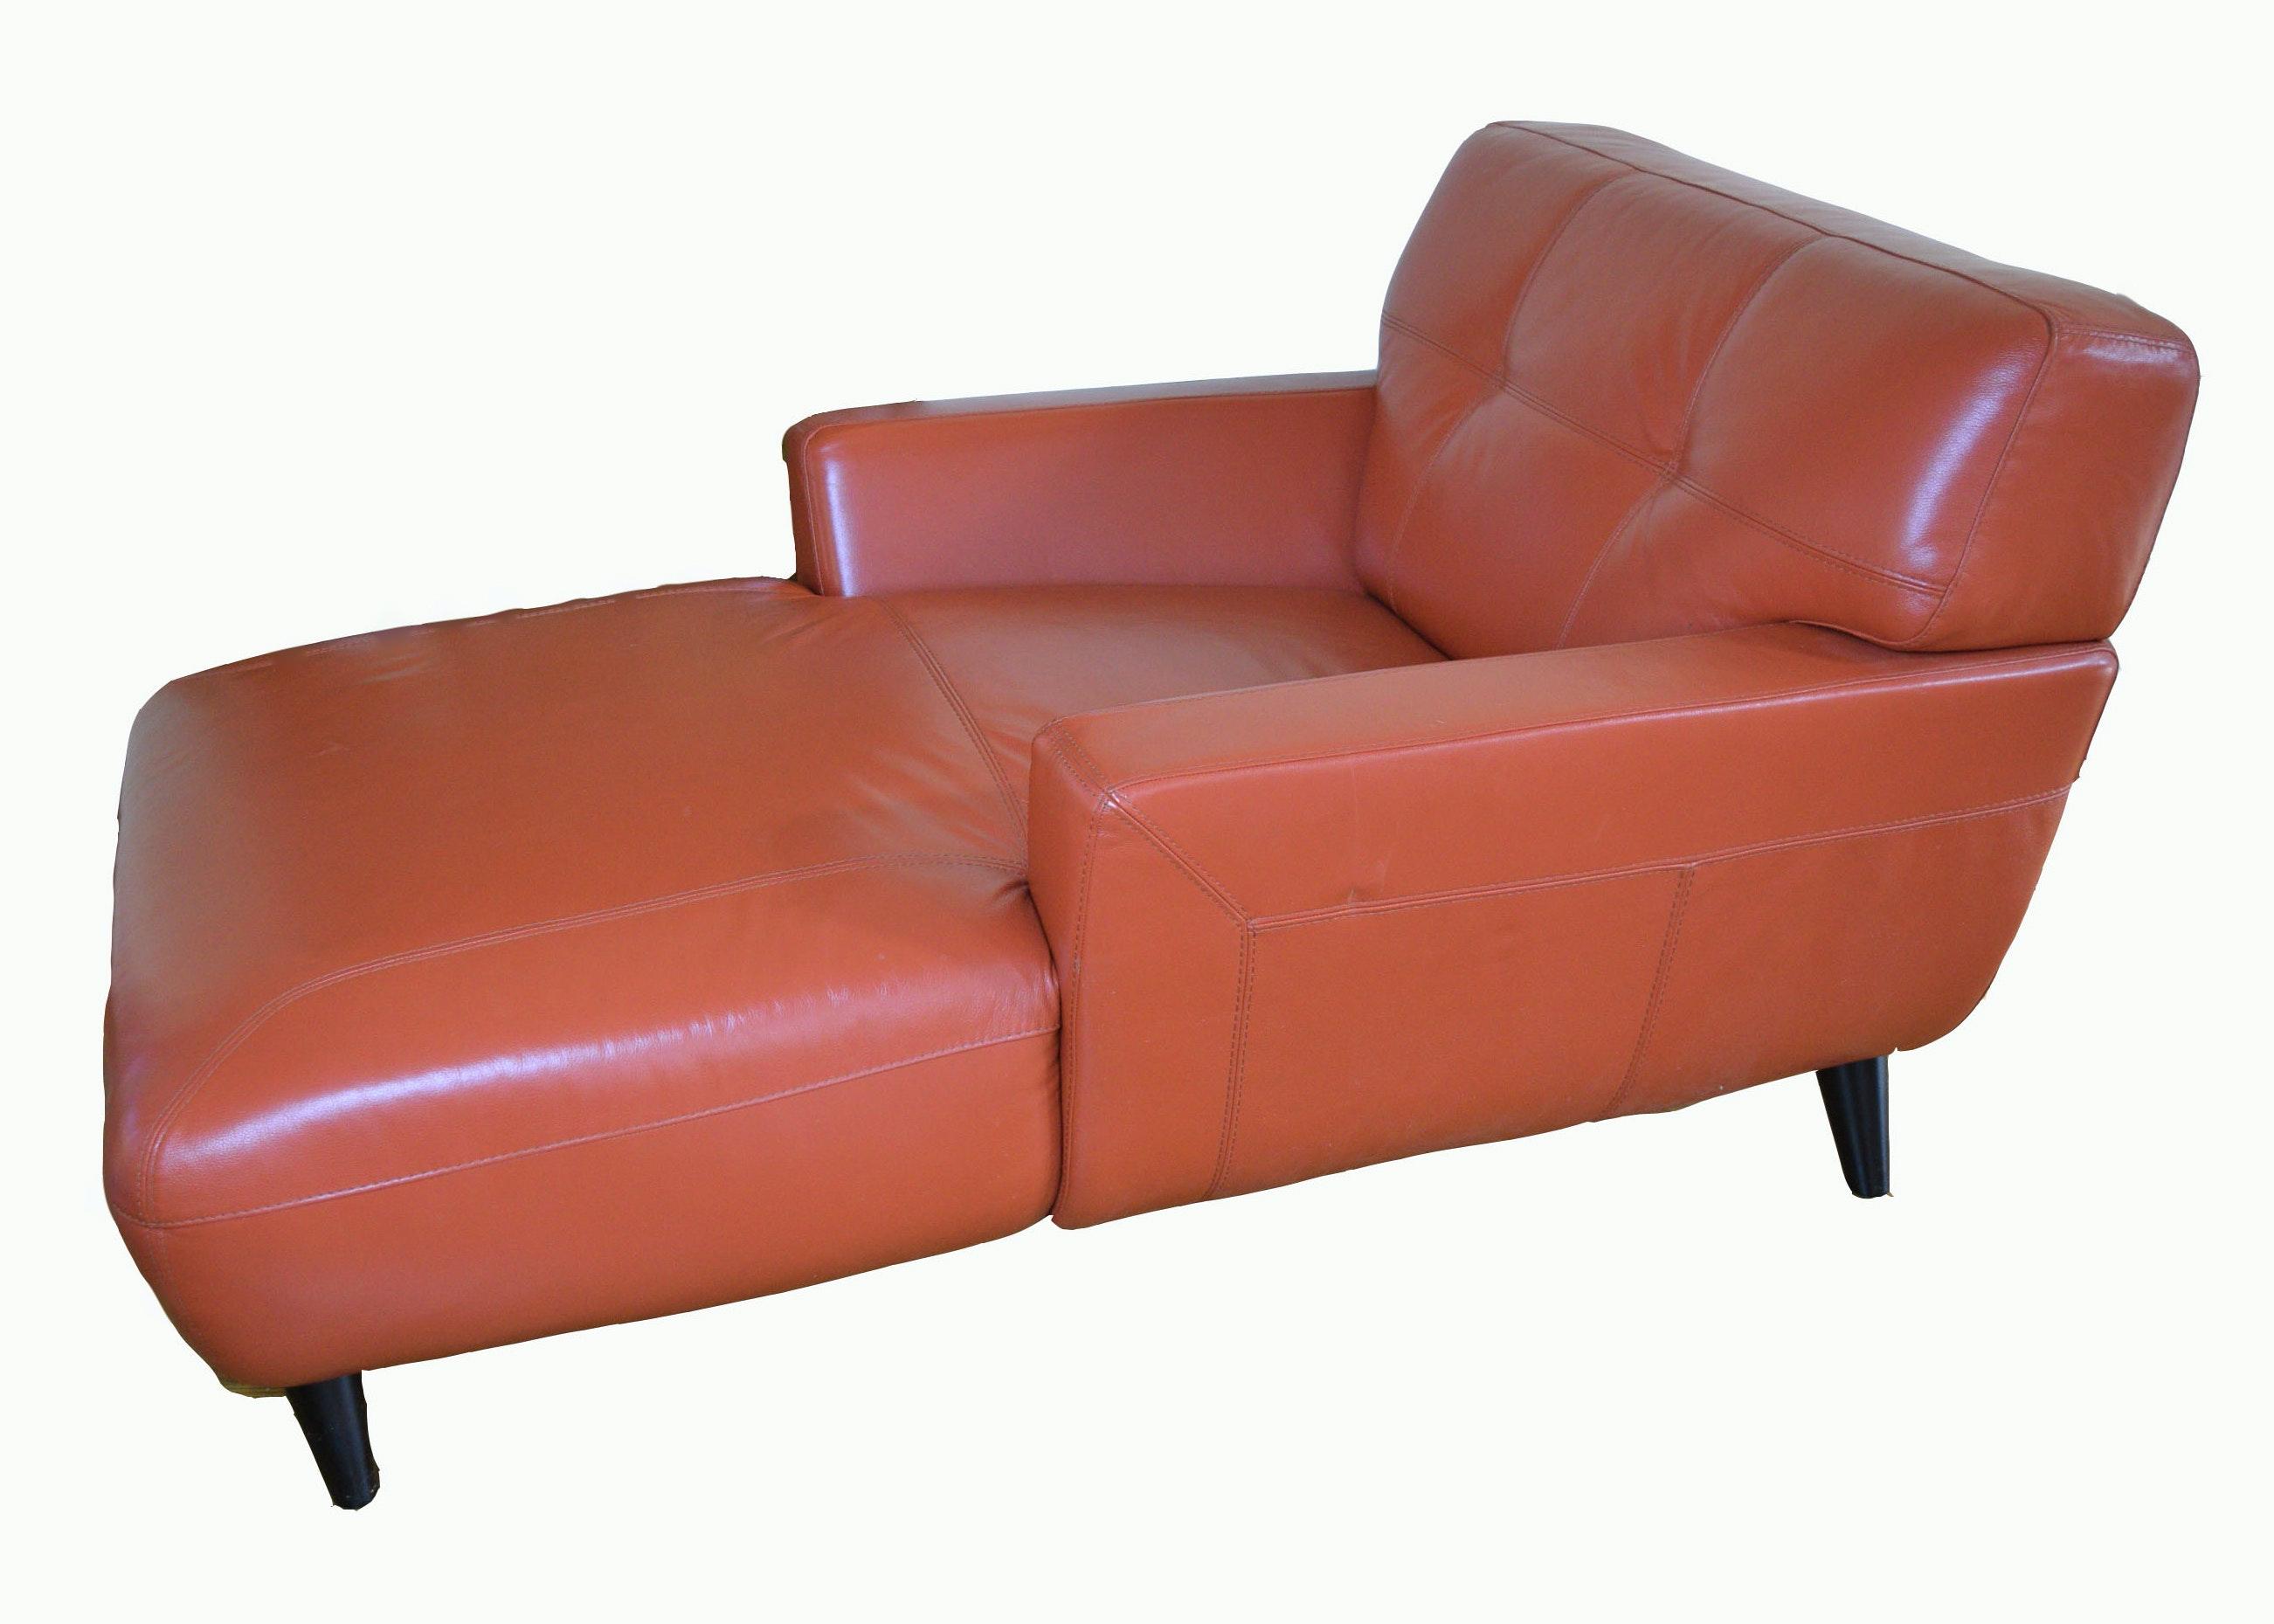 Chateau Du0027Ax Orange Leather Chair